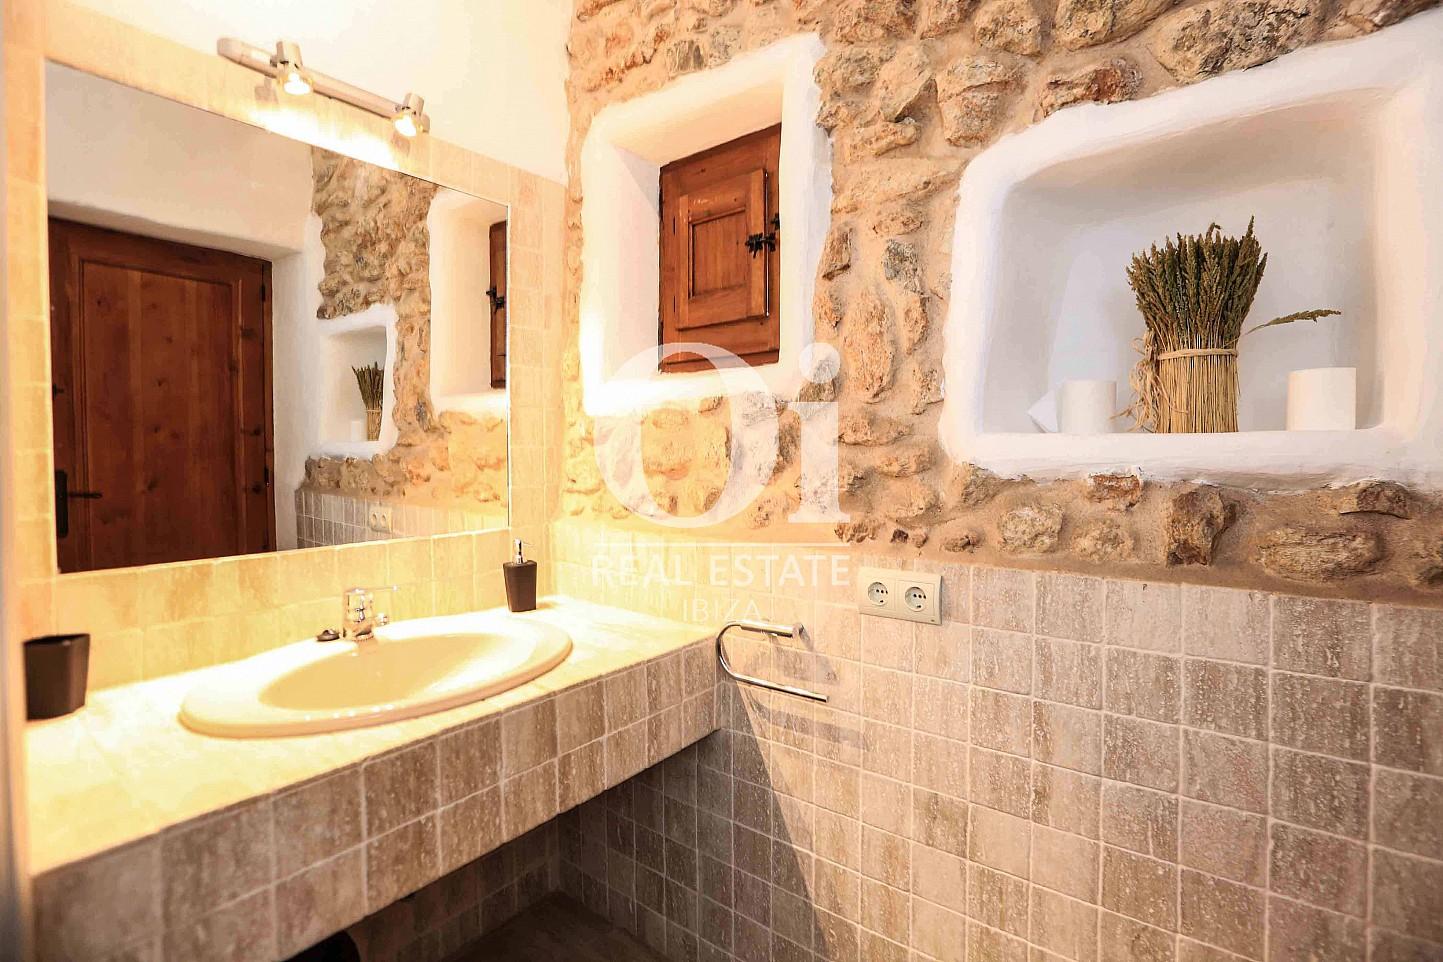 Baño de casa en alquiler vacacional en zona Puig d'en Valls, Ibiza